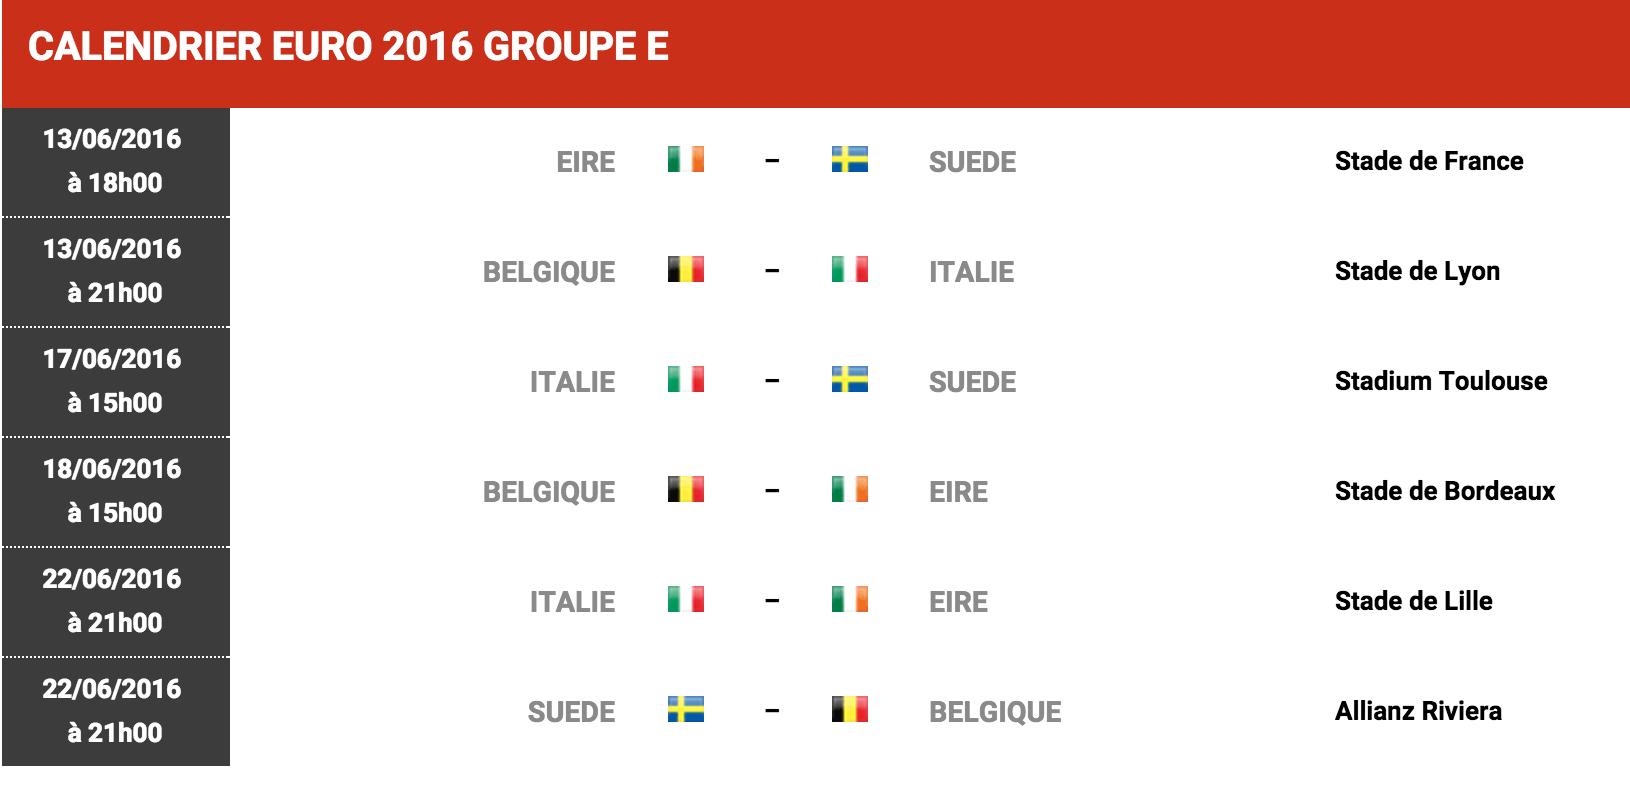 Euro Calendrier Match.Calendrier Matches Euro 2016 Groupe E Football Sports Le